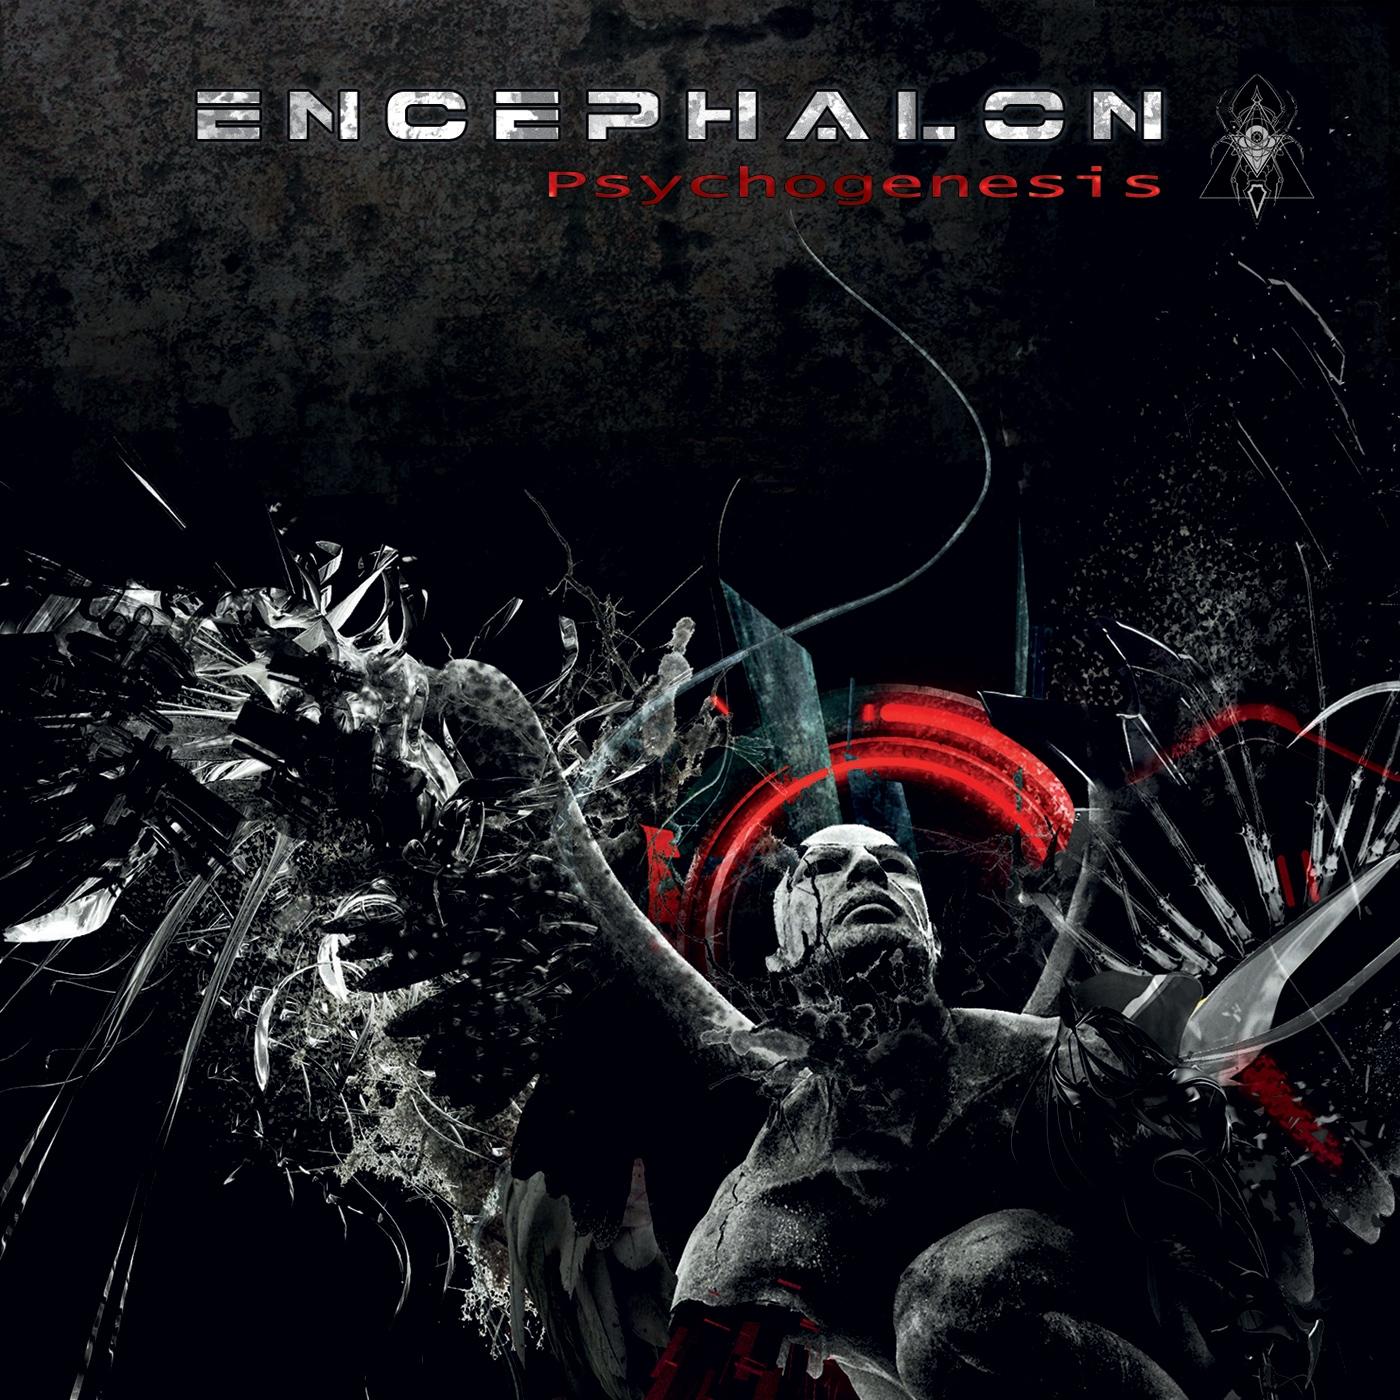 ENCEPHALON Psychogenesis CD 2015 (VÖ 24.04)